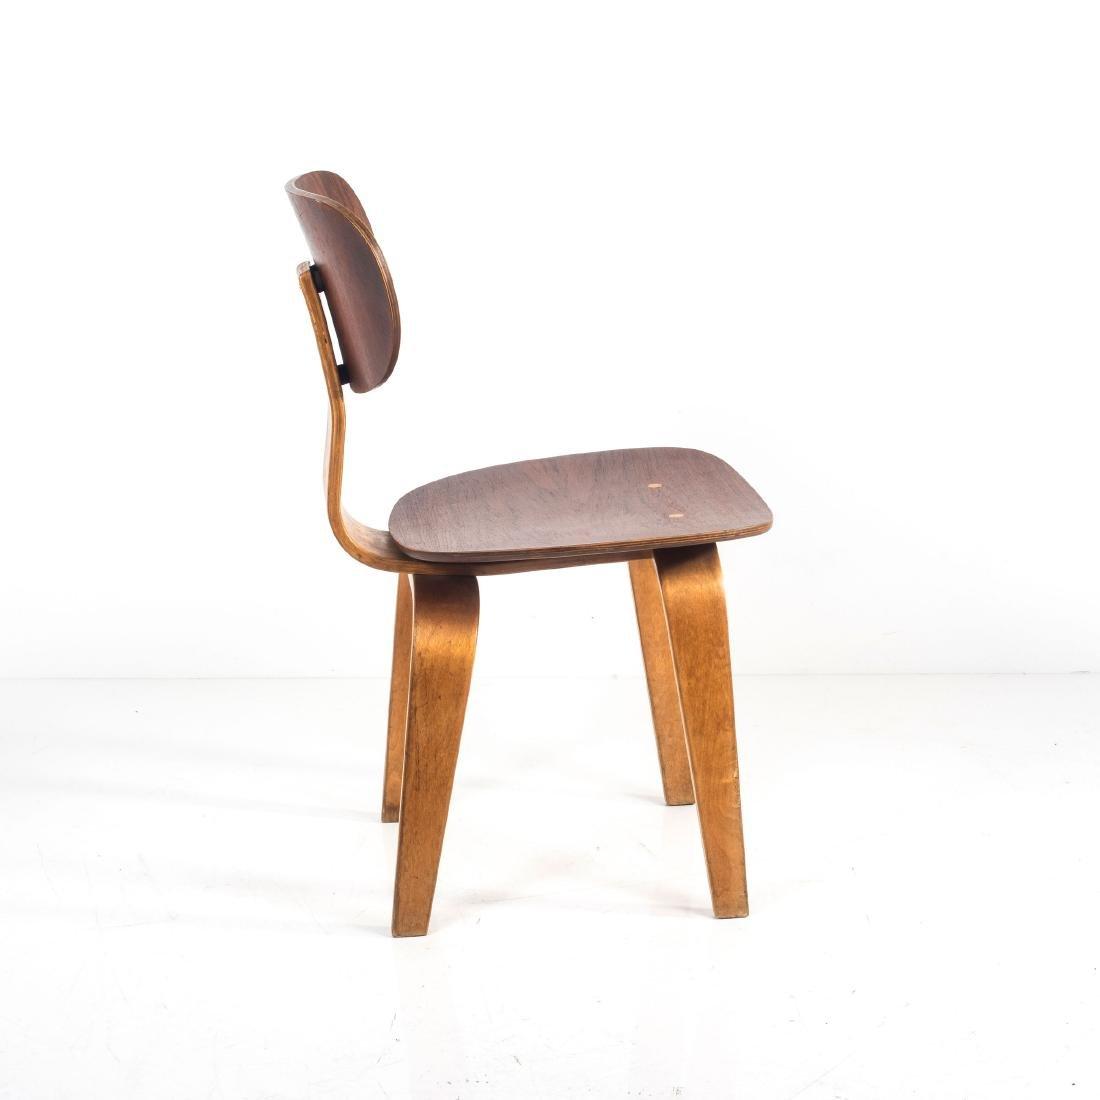 Four 'SB16' chairs, 1955 - 6